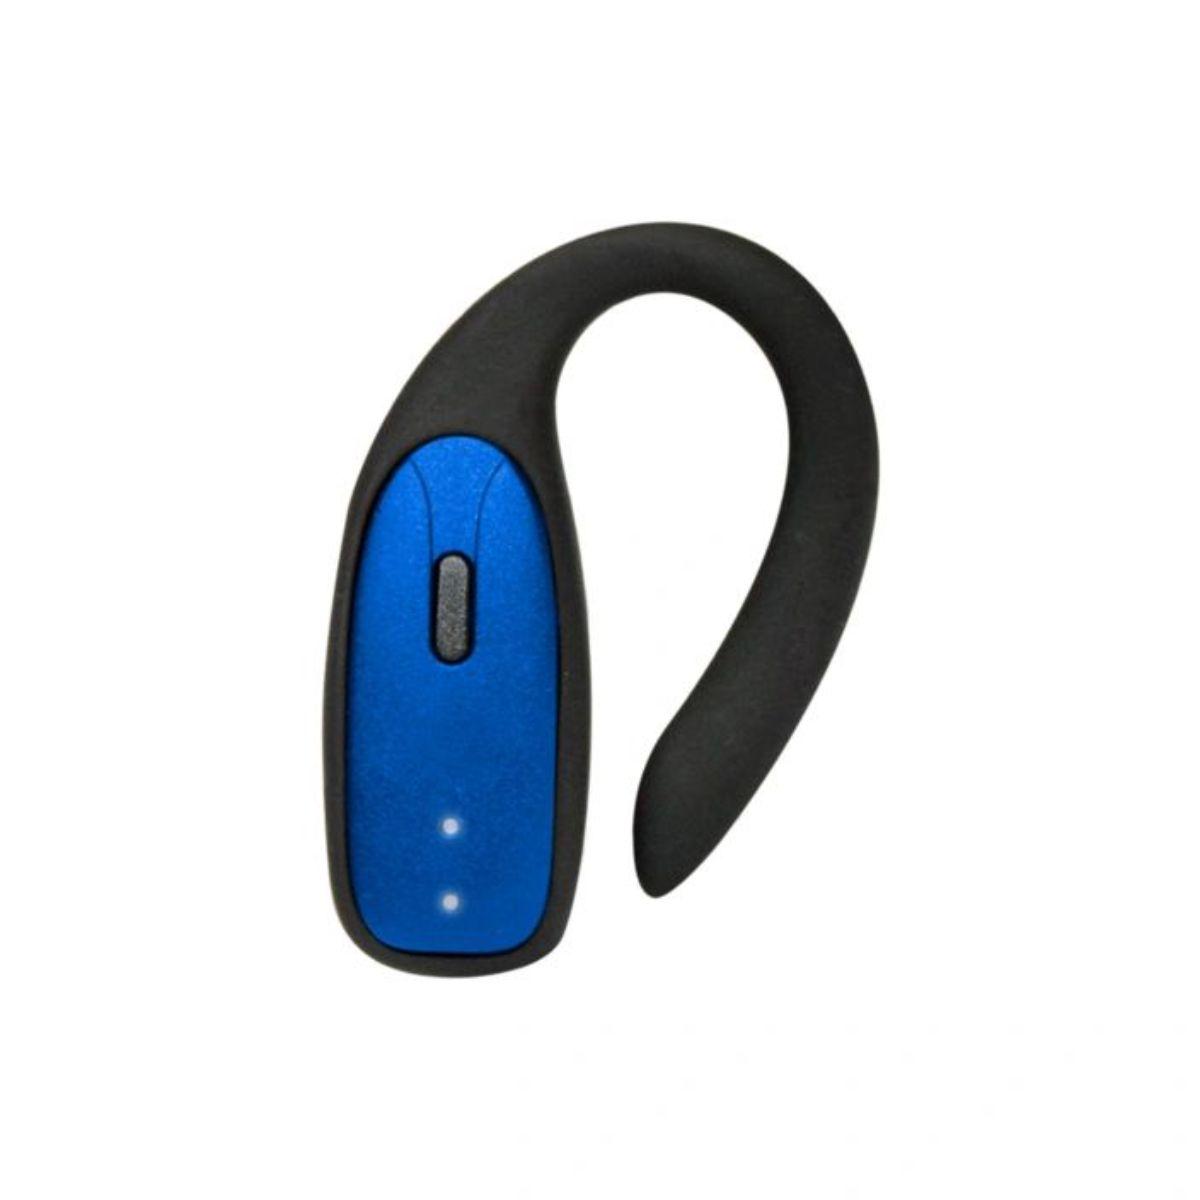 auriculares inalambricos tws flex 2 1